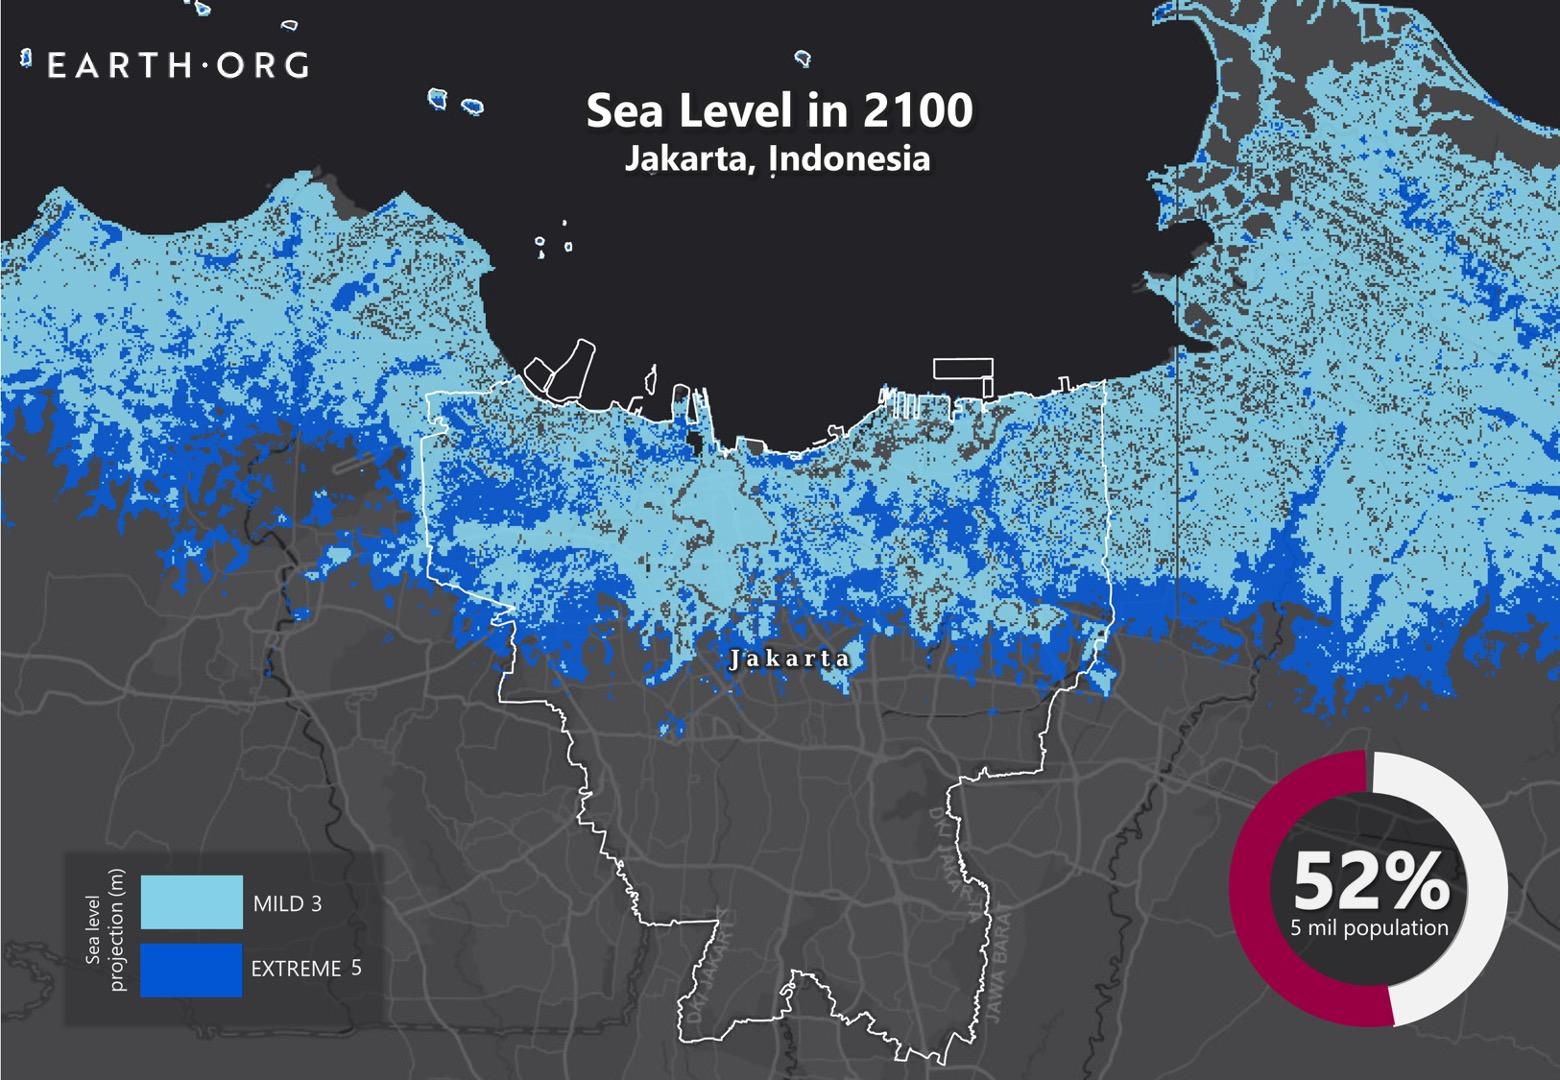 sea level rise by 2100 jakarta